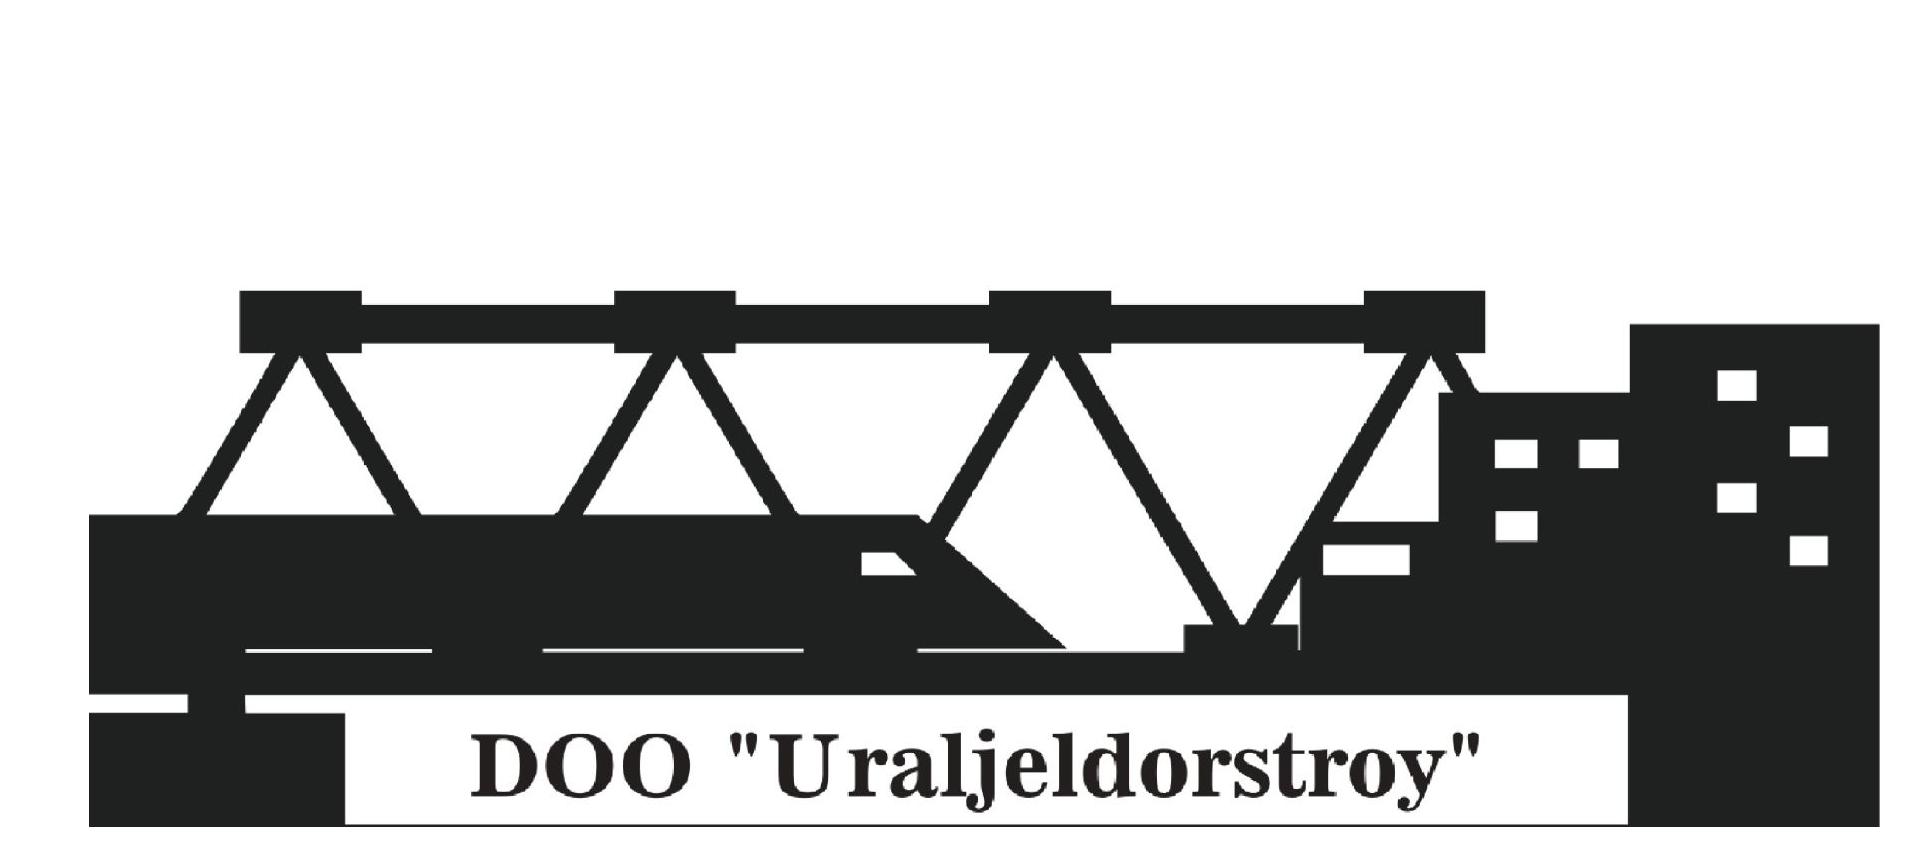 URALJELDORSTROY DOO